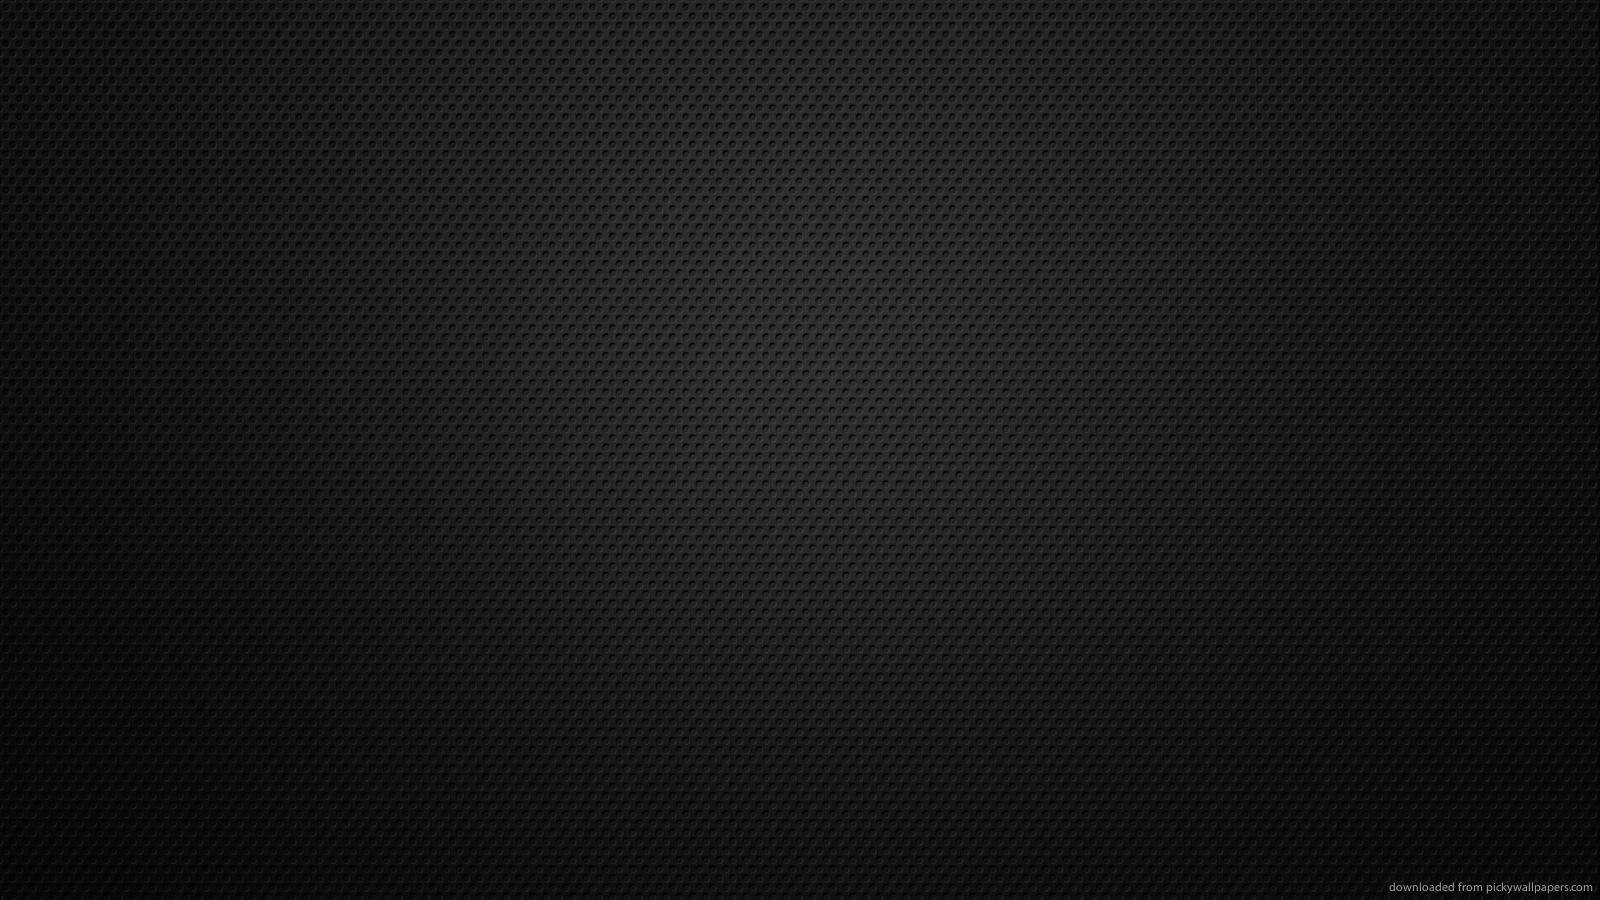 Download 1600x900 Simple Black  HD Wallpaper